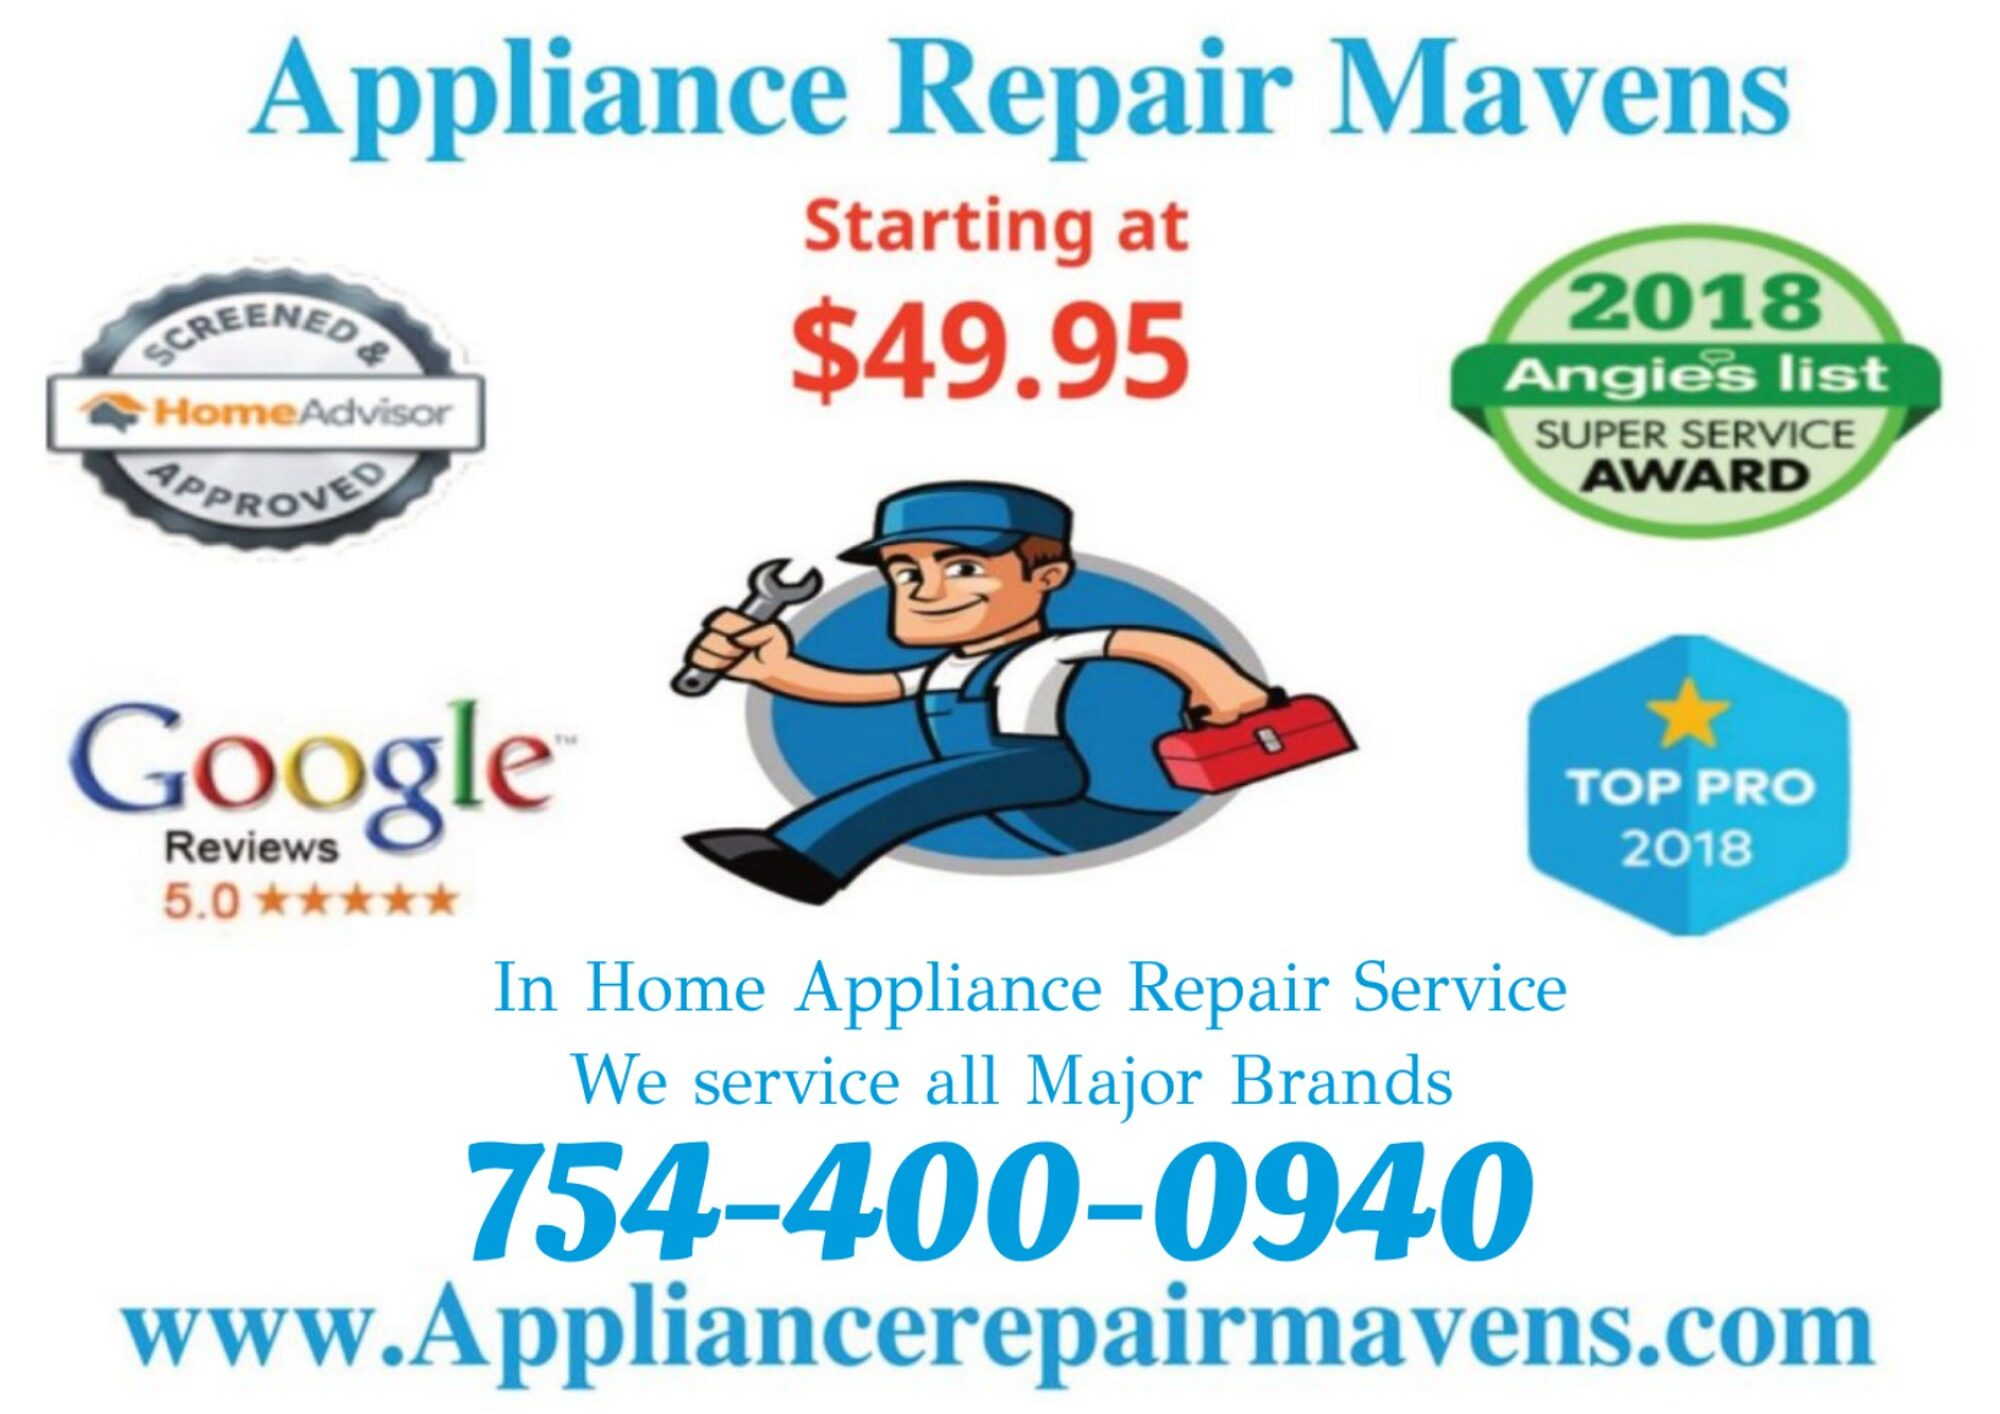 Appliance Repair Mavens of Broward County